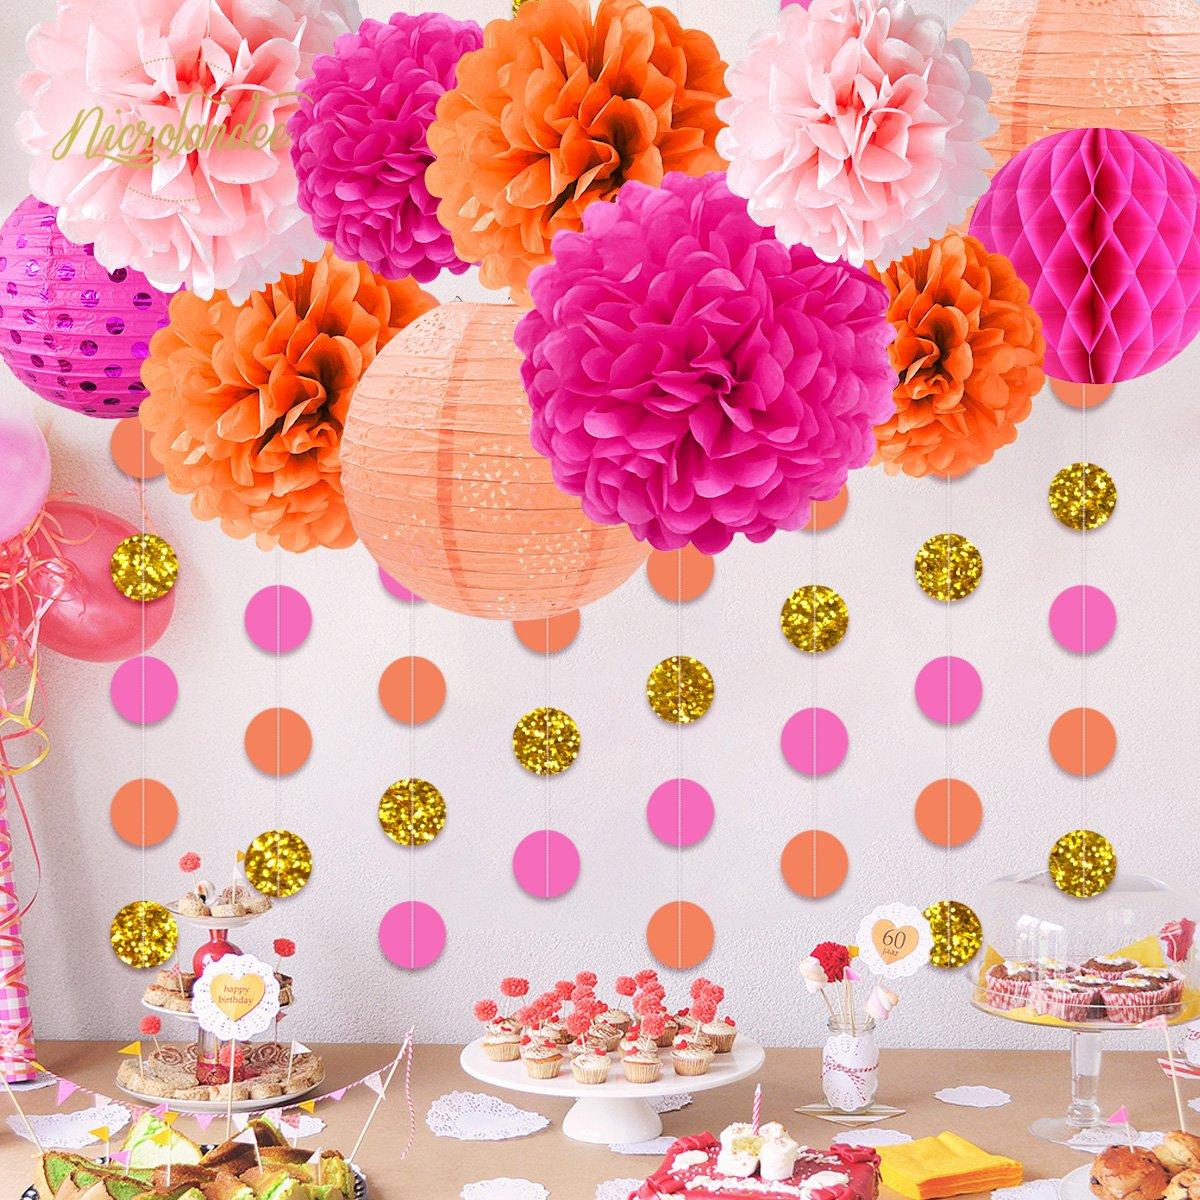 NICROLANDEE Pink and Orange Birthday Party Decoration Pack Paper Lanterns Tissue Flower Poms Gold Glitter Garland for Flamingo Bachelorette Birthday Baby Shower Thanksgiving Fiesta Festival Decor by NICROLANDEE (Image #2)